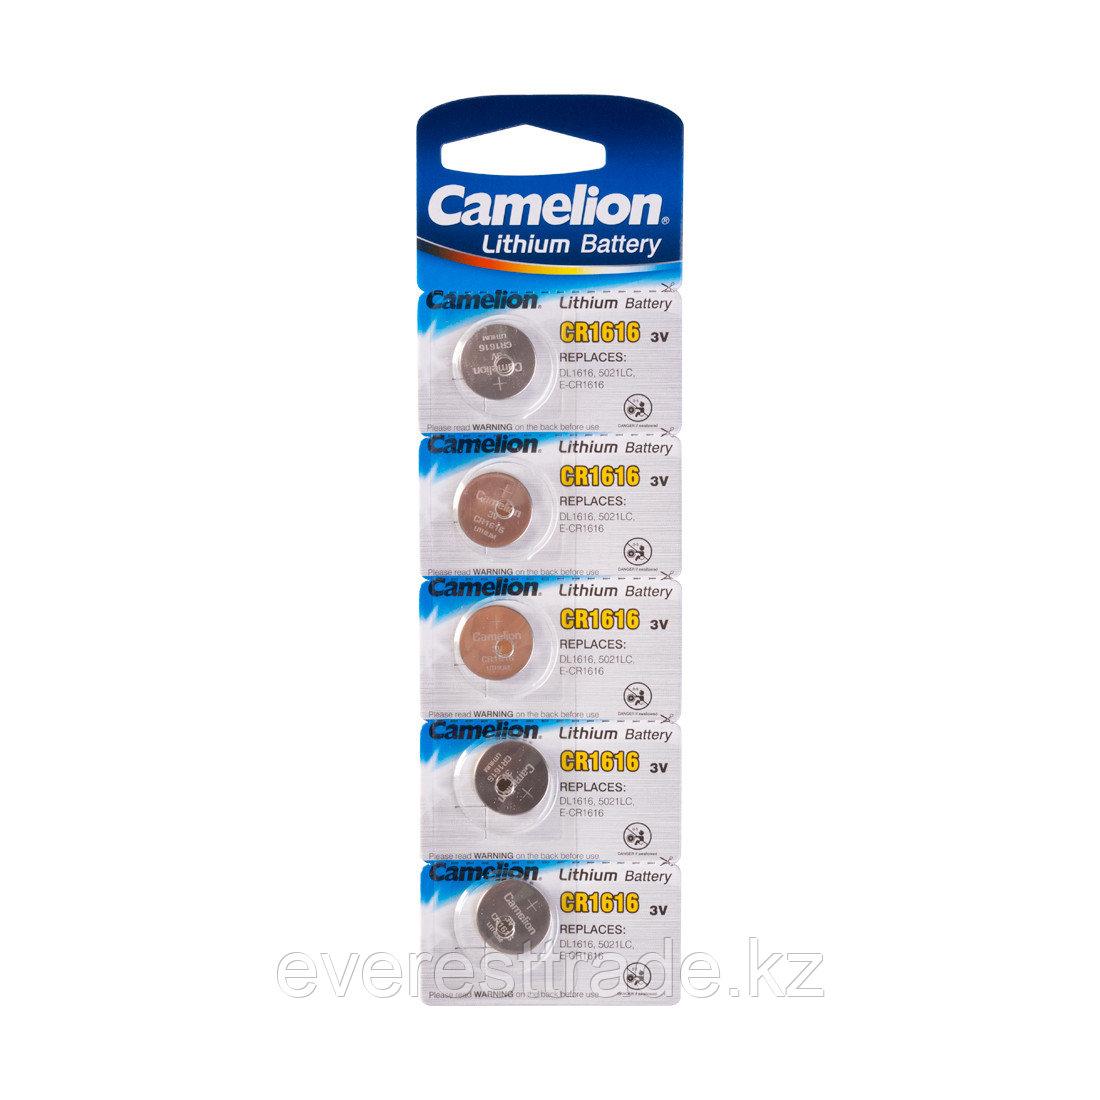 Camelion Батарейка, CAMELION, CR1616-BP5, Lithium Battery, CR1616, 3V, 220 mAh, 5 шт в блистере